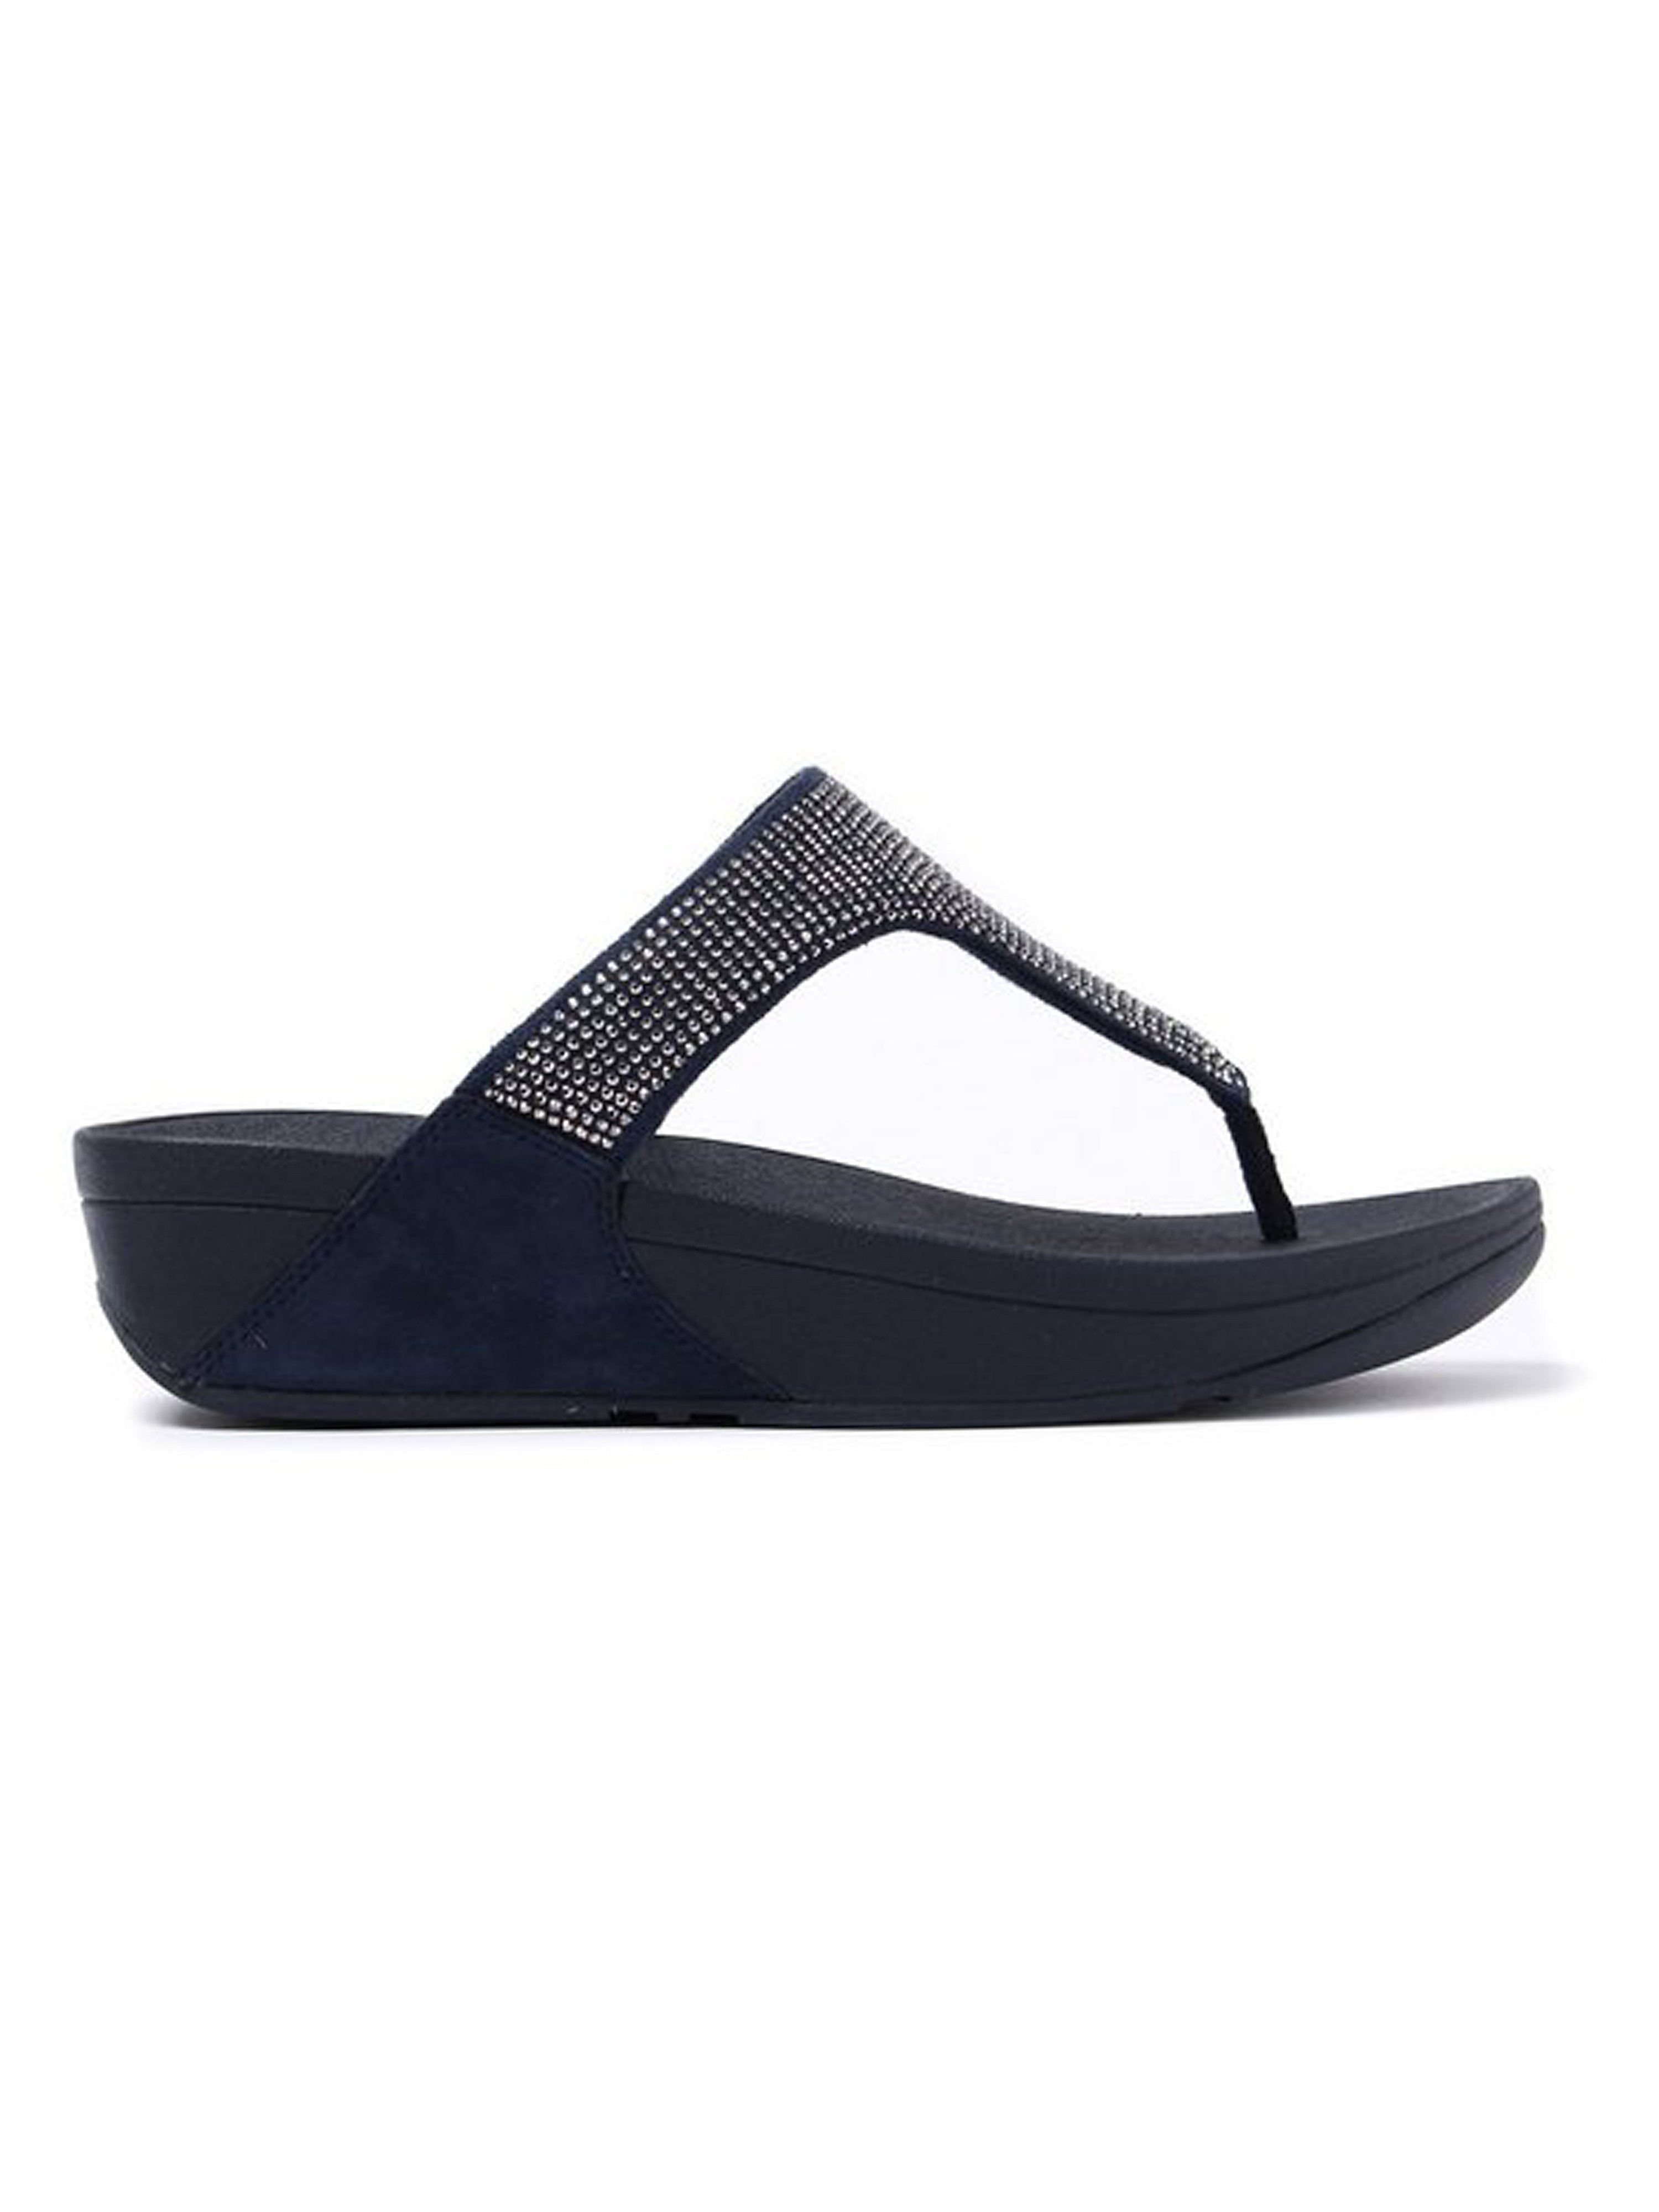 FitFlop Women's Slinky Rokkit Toe-Post Sandals - Super Navy